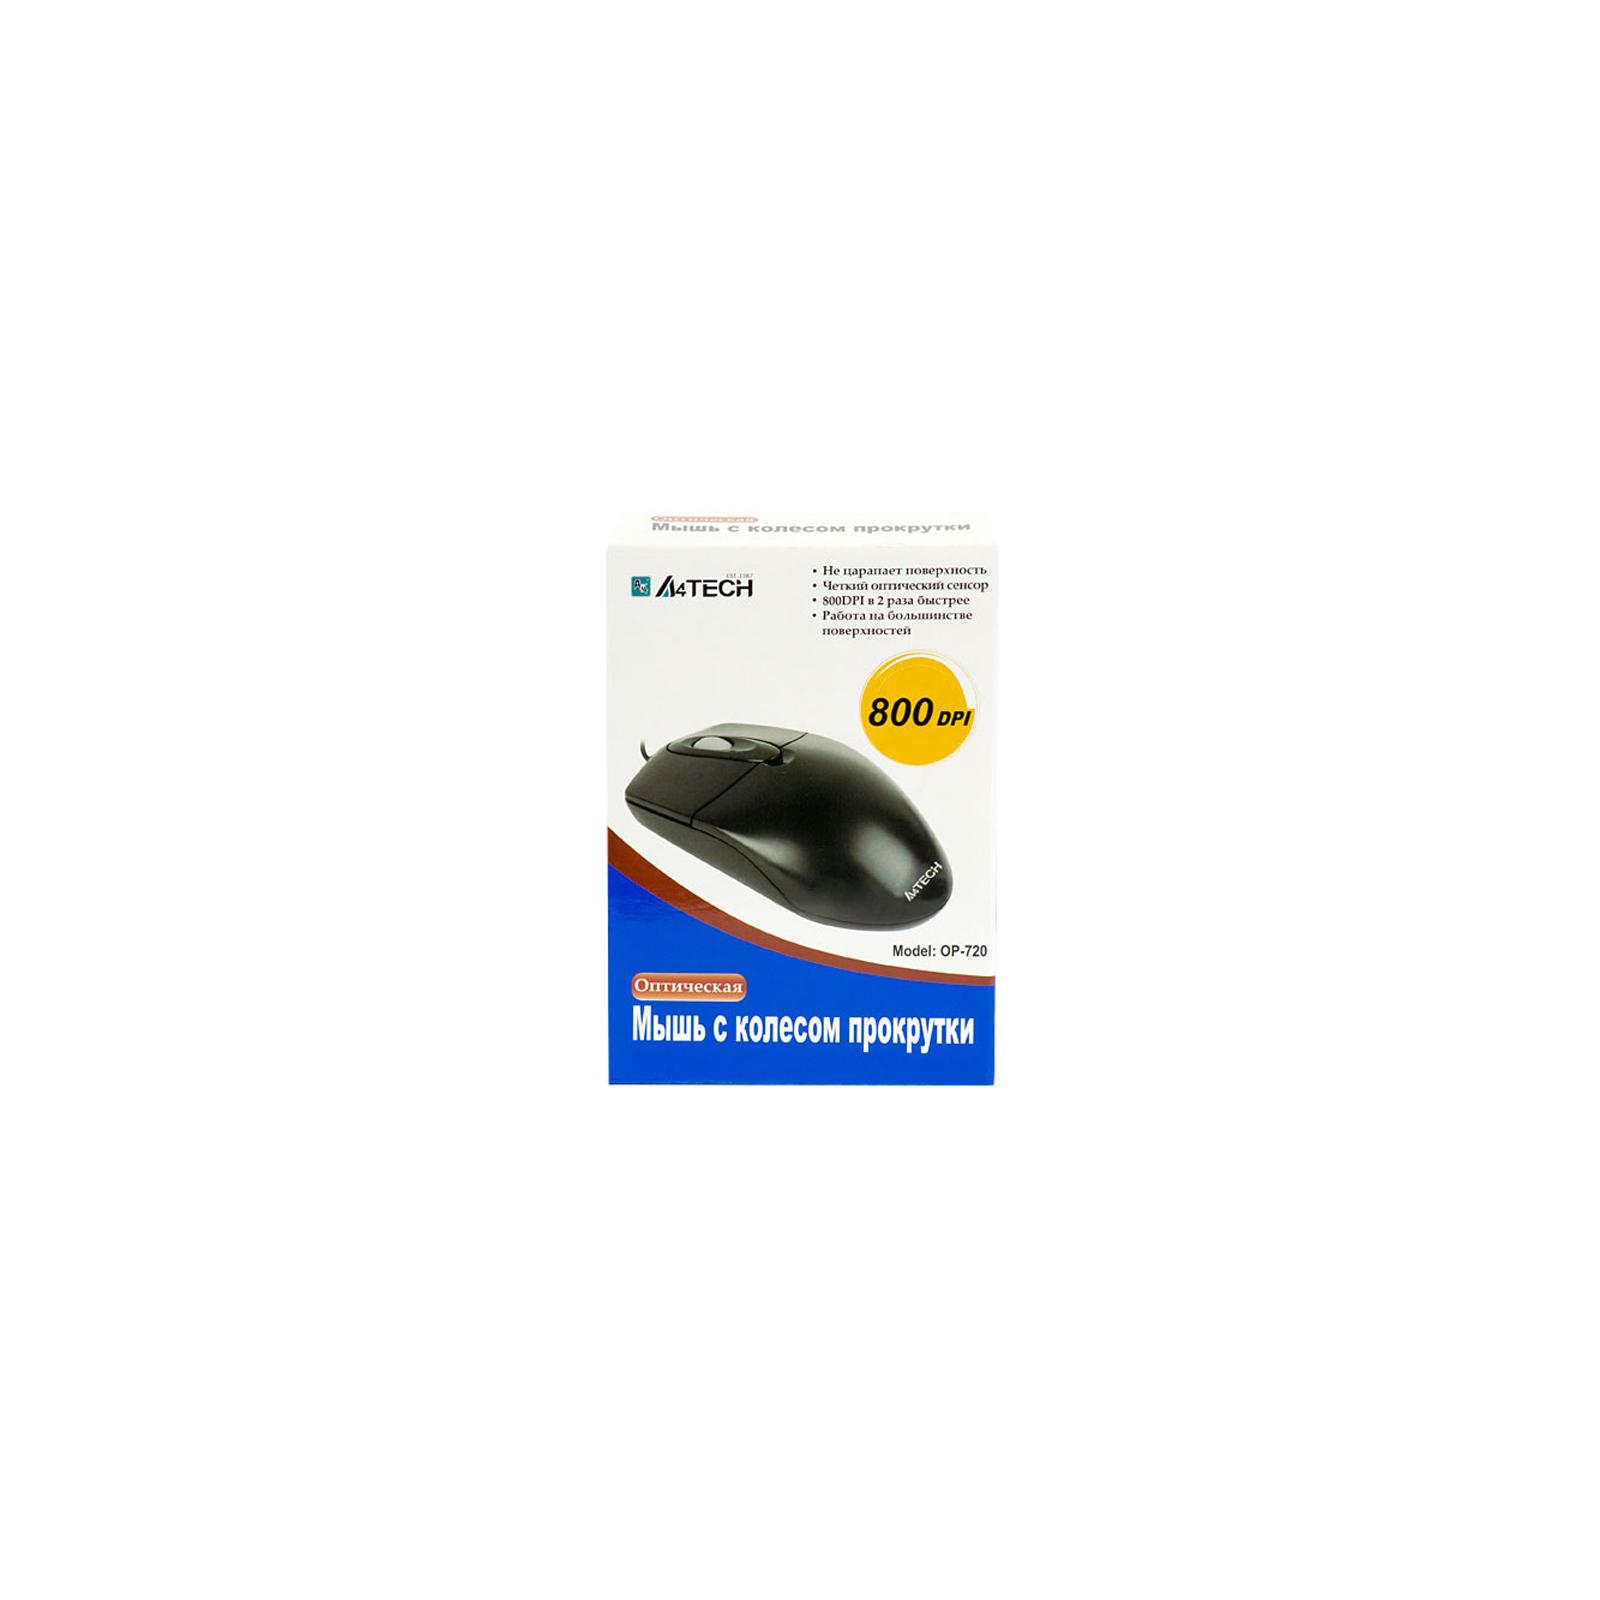 Мышка OP-720 A4-tech (OP-720 BLACK-PS) изображение 3